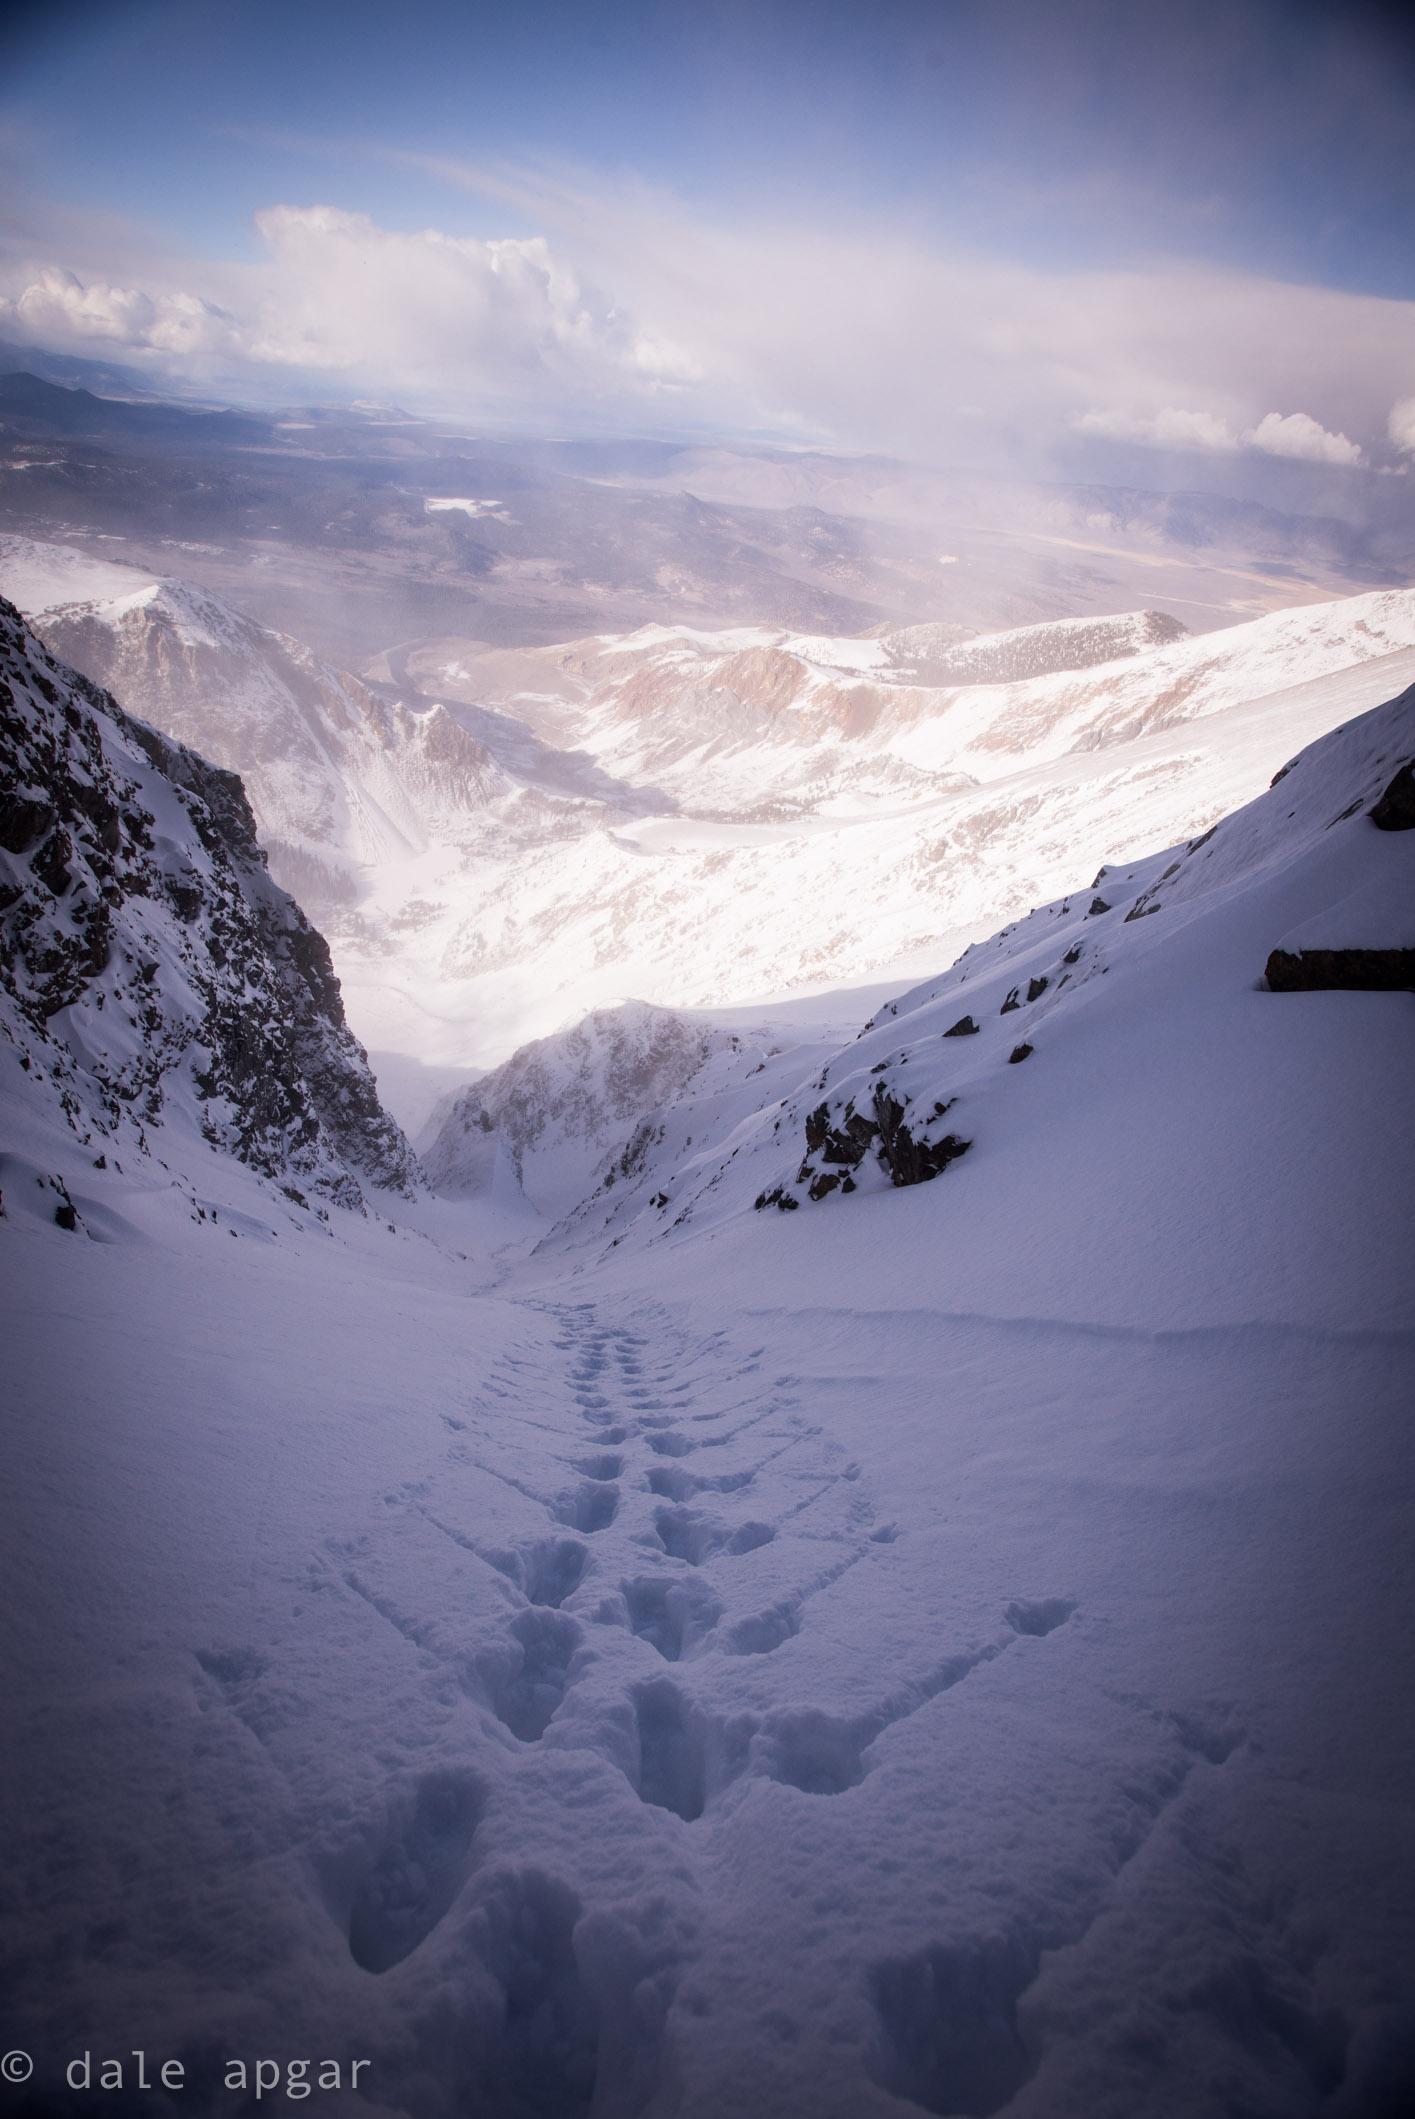 dale_apgar_ski-50.jpg